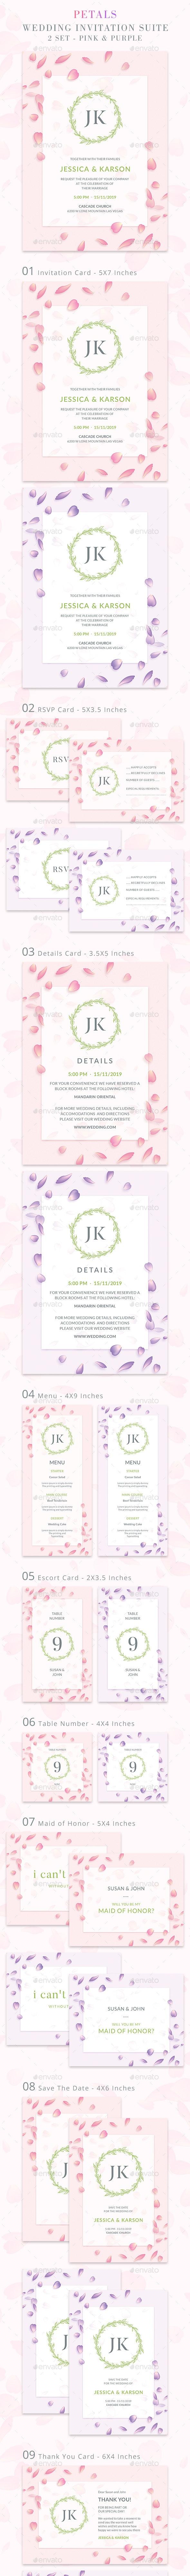 Wedding Invitation Suite - Petals - Weddings Cards & Invites